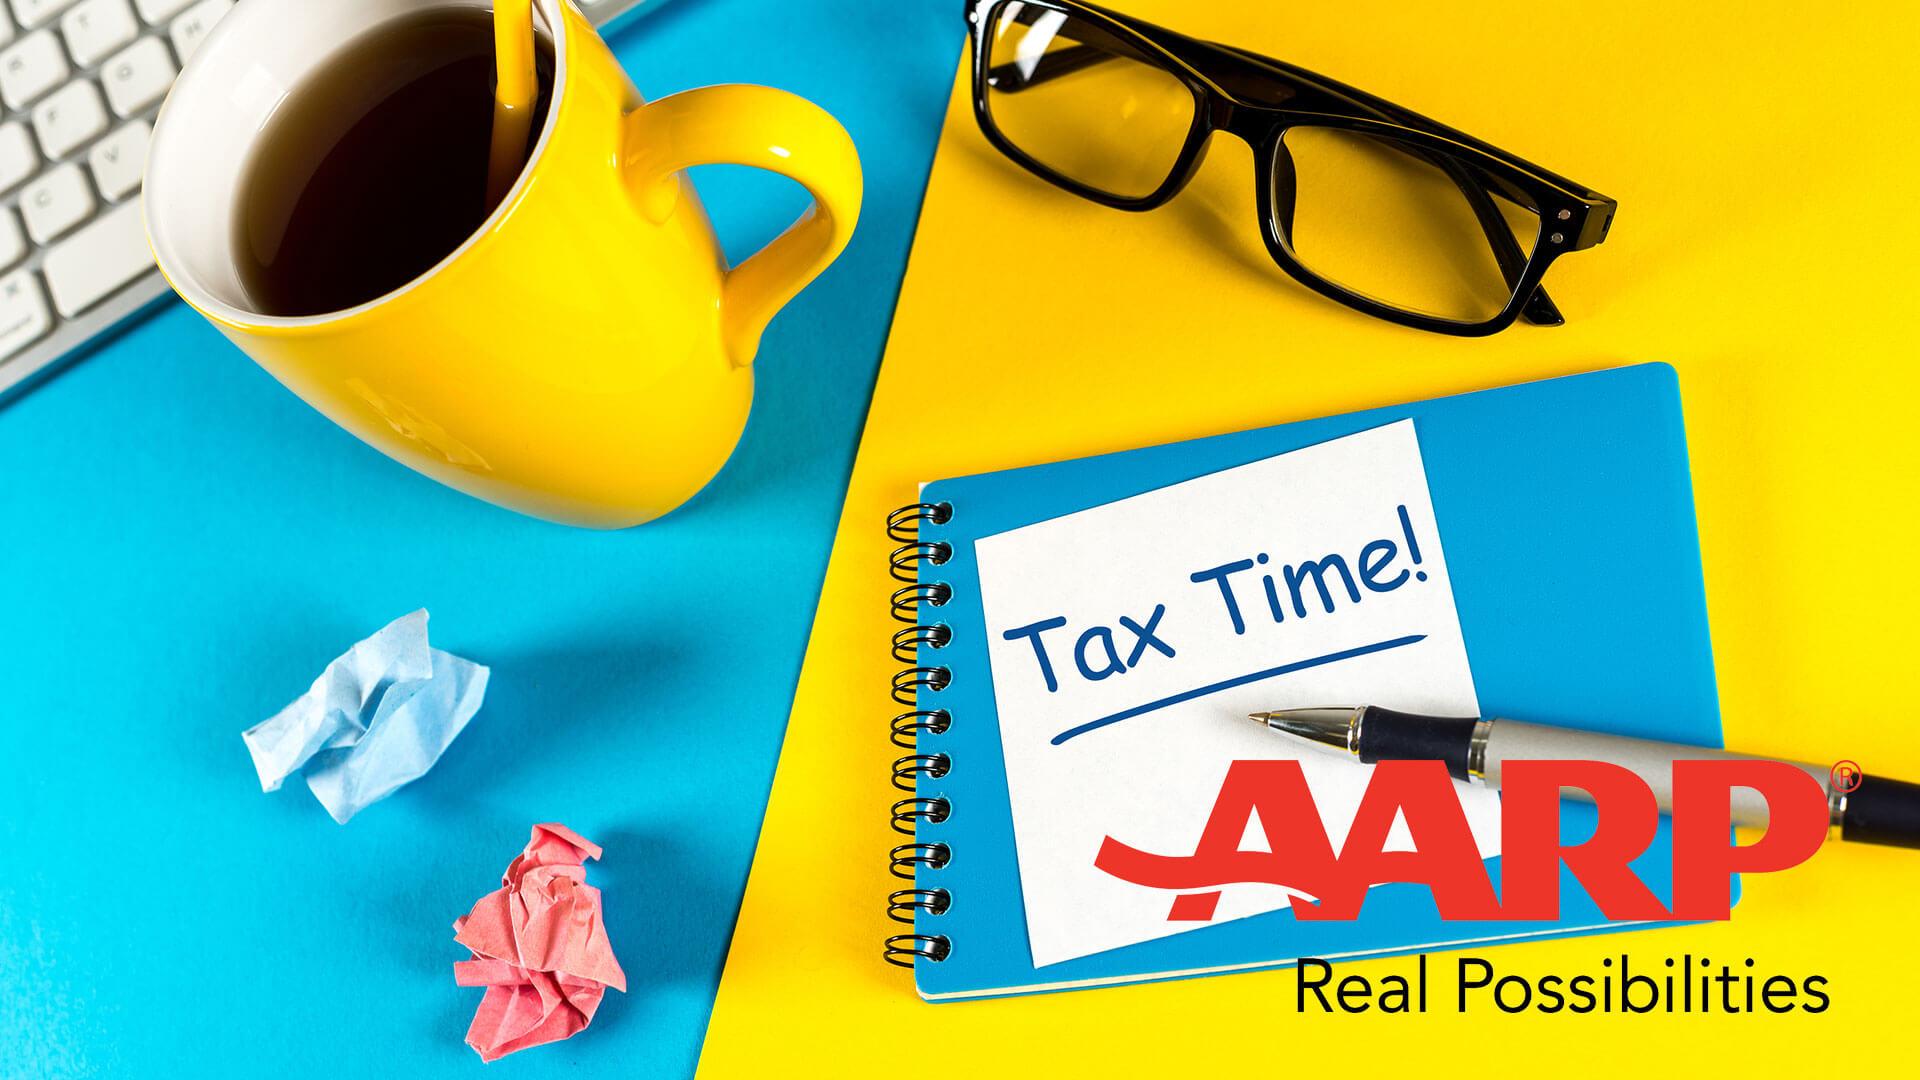 AARP Tax Aide 2019